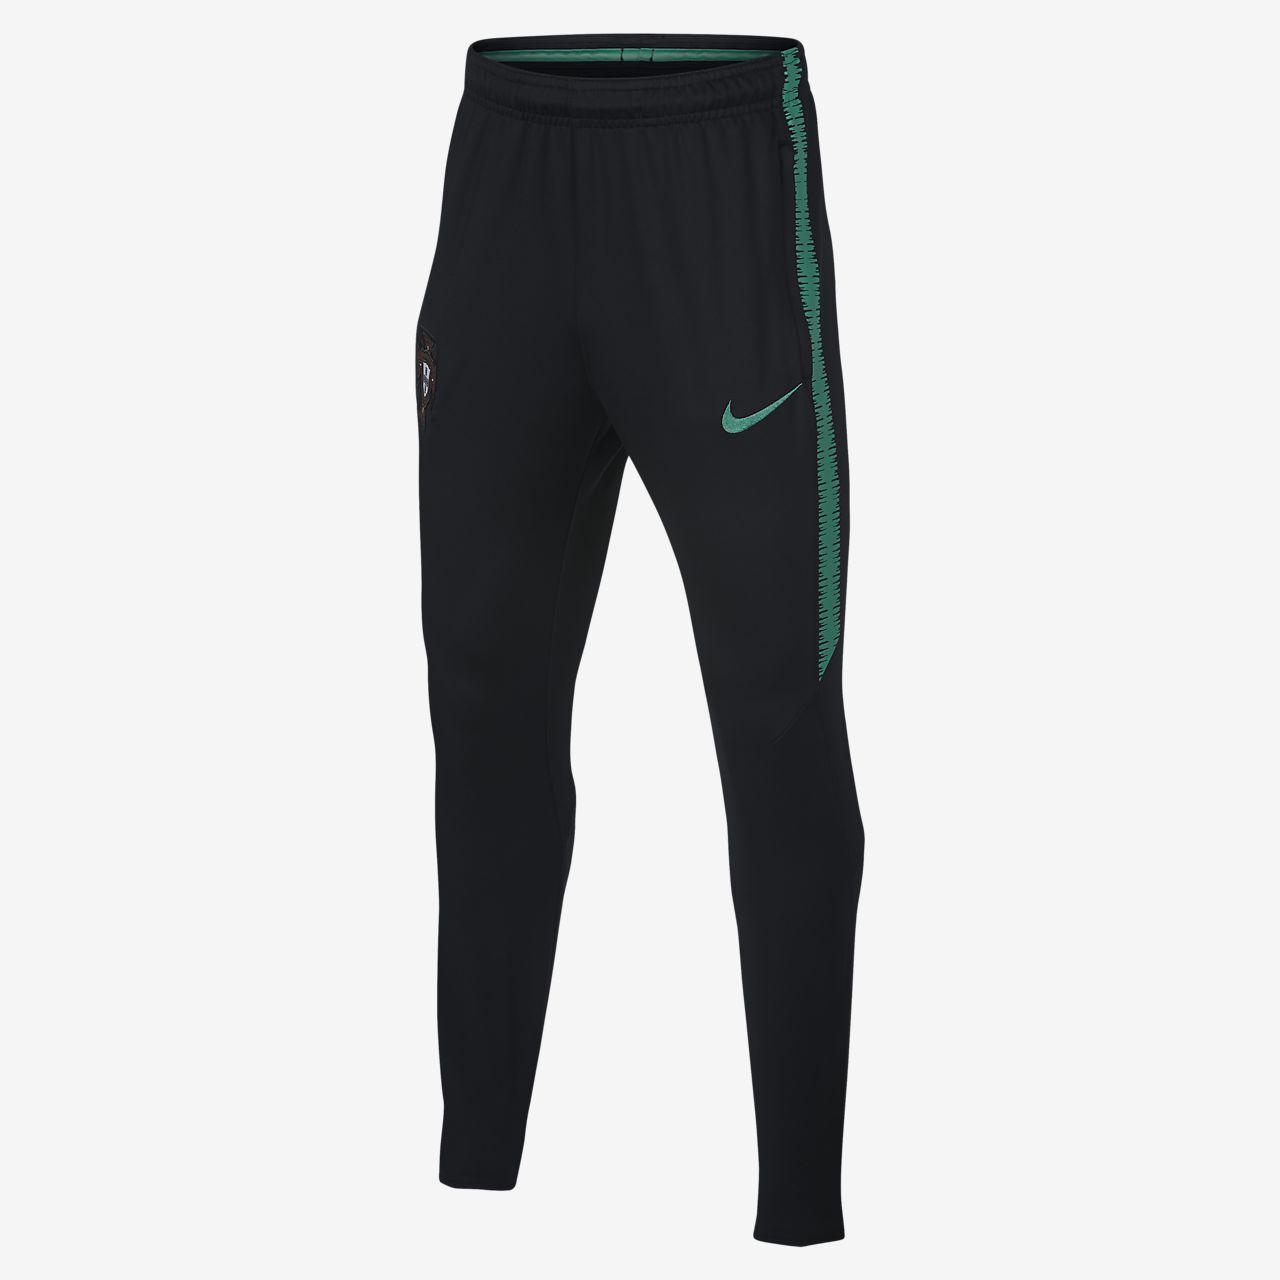 Pantalones de fútbol para niños talla grande Portugal Dri-FIT Squad